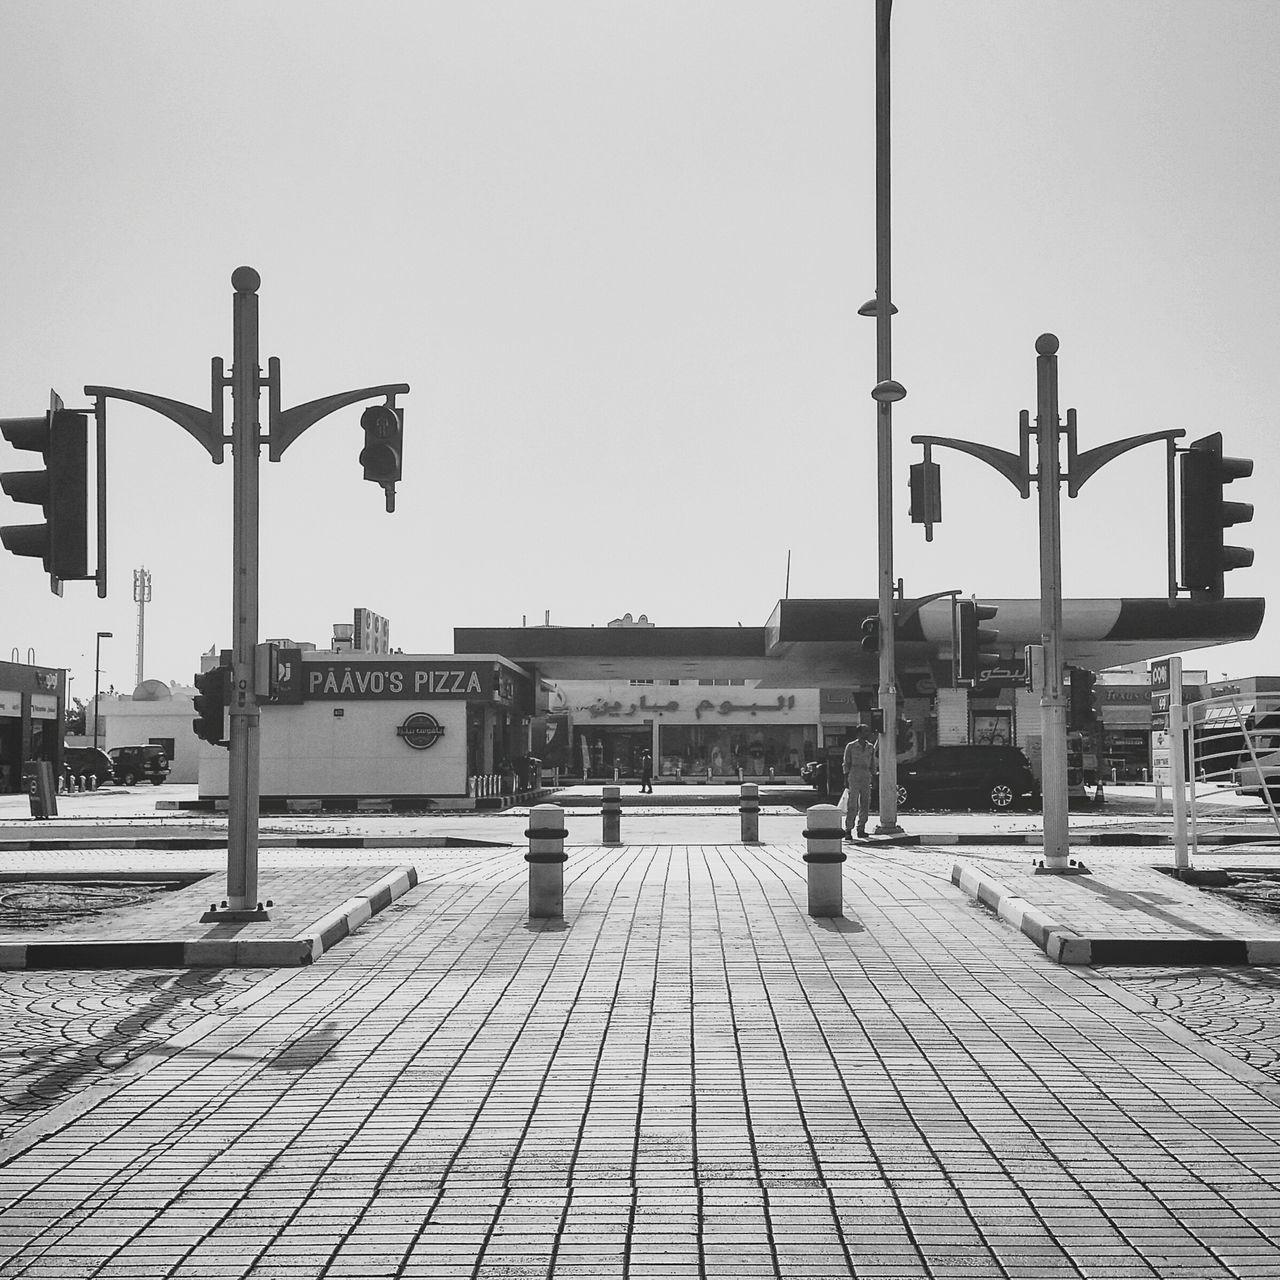 Finding New Frontiers Day Sky City Dubai Street Street Photography Photography UAE 3kshots DXB Blackandwhite Jumeirah❤️ Traficlight Bnw Blockai